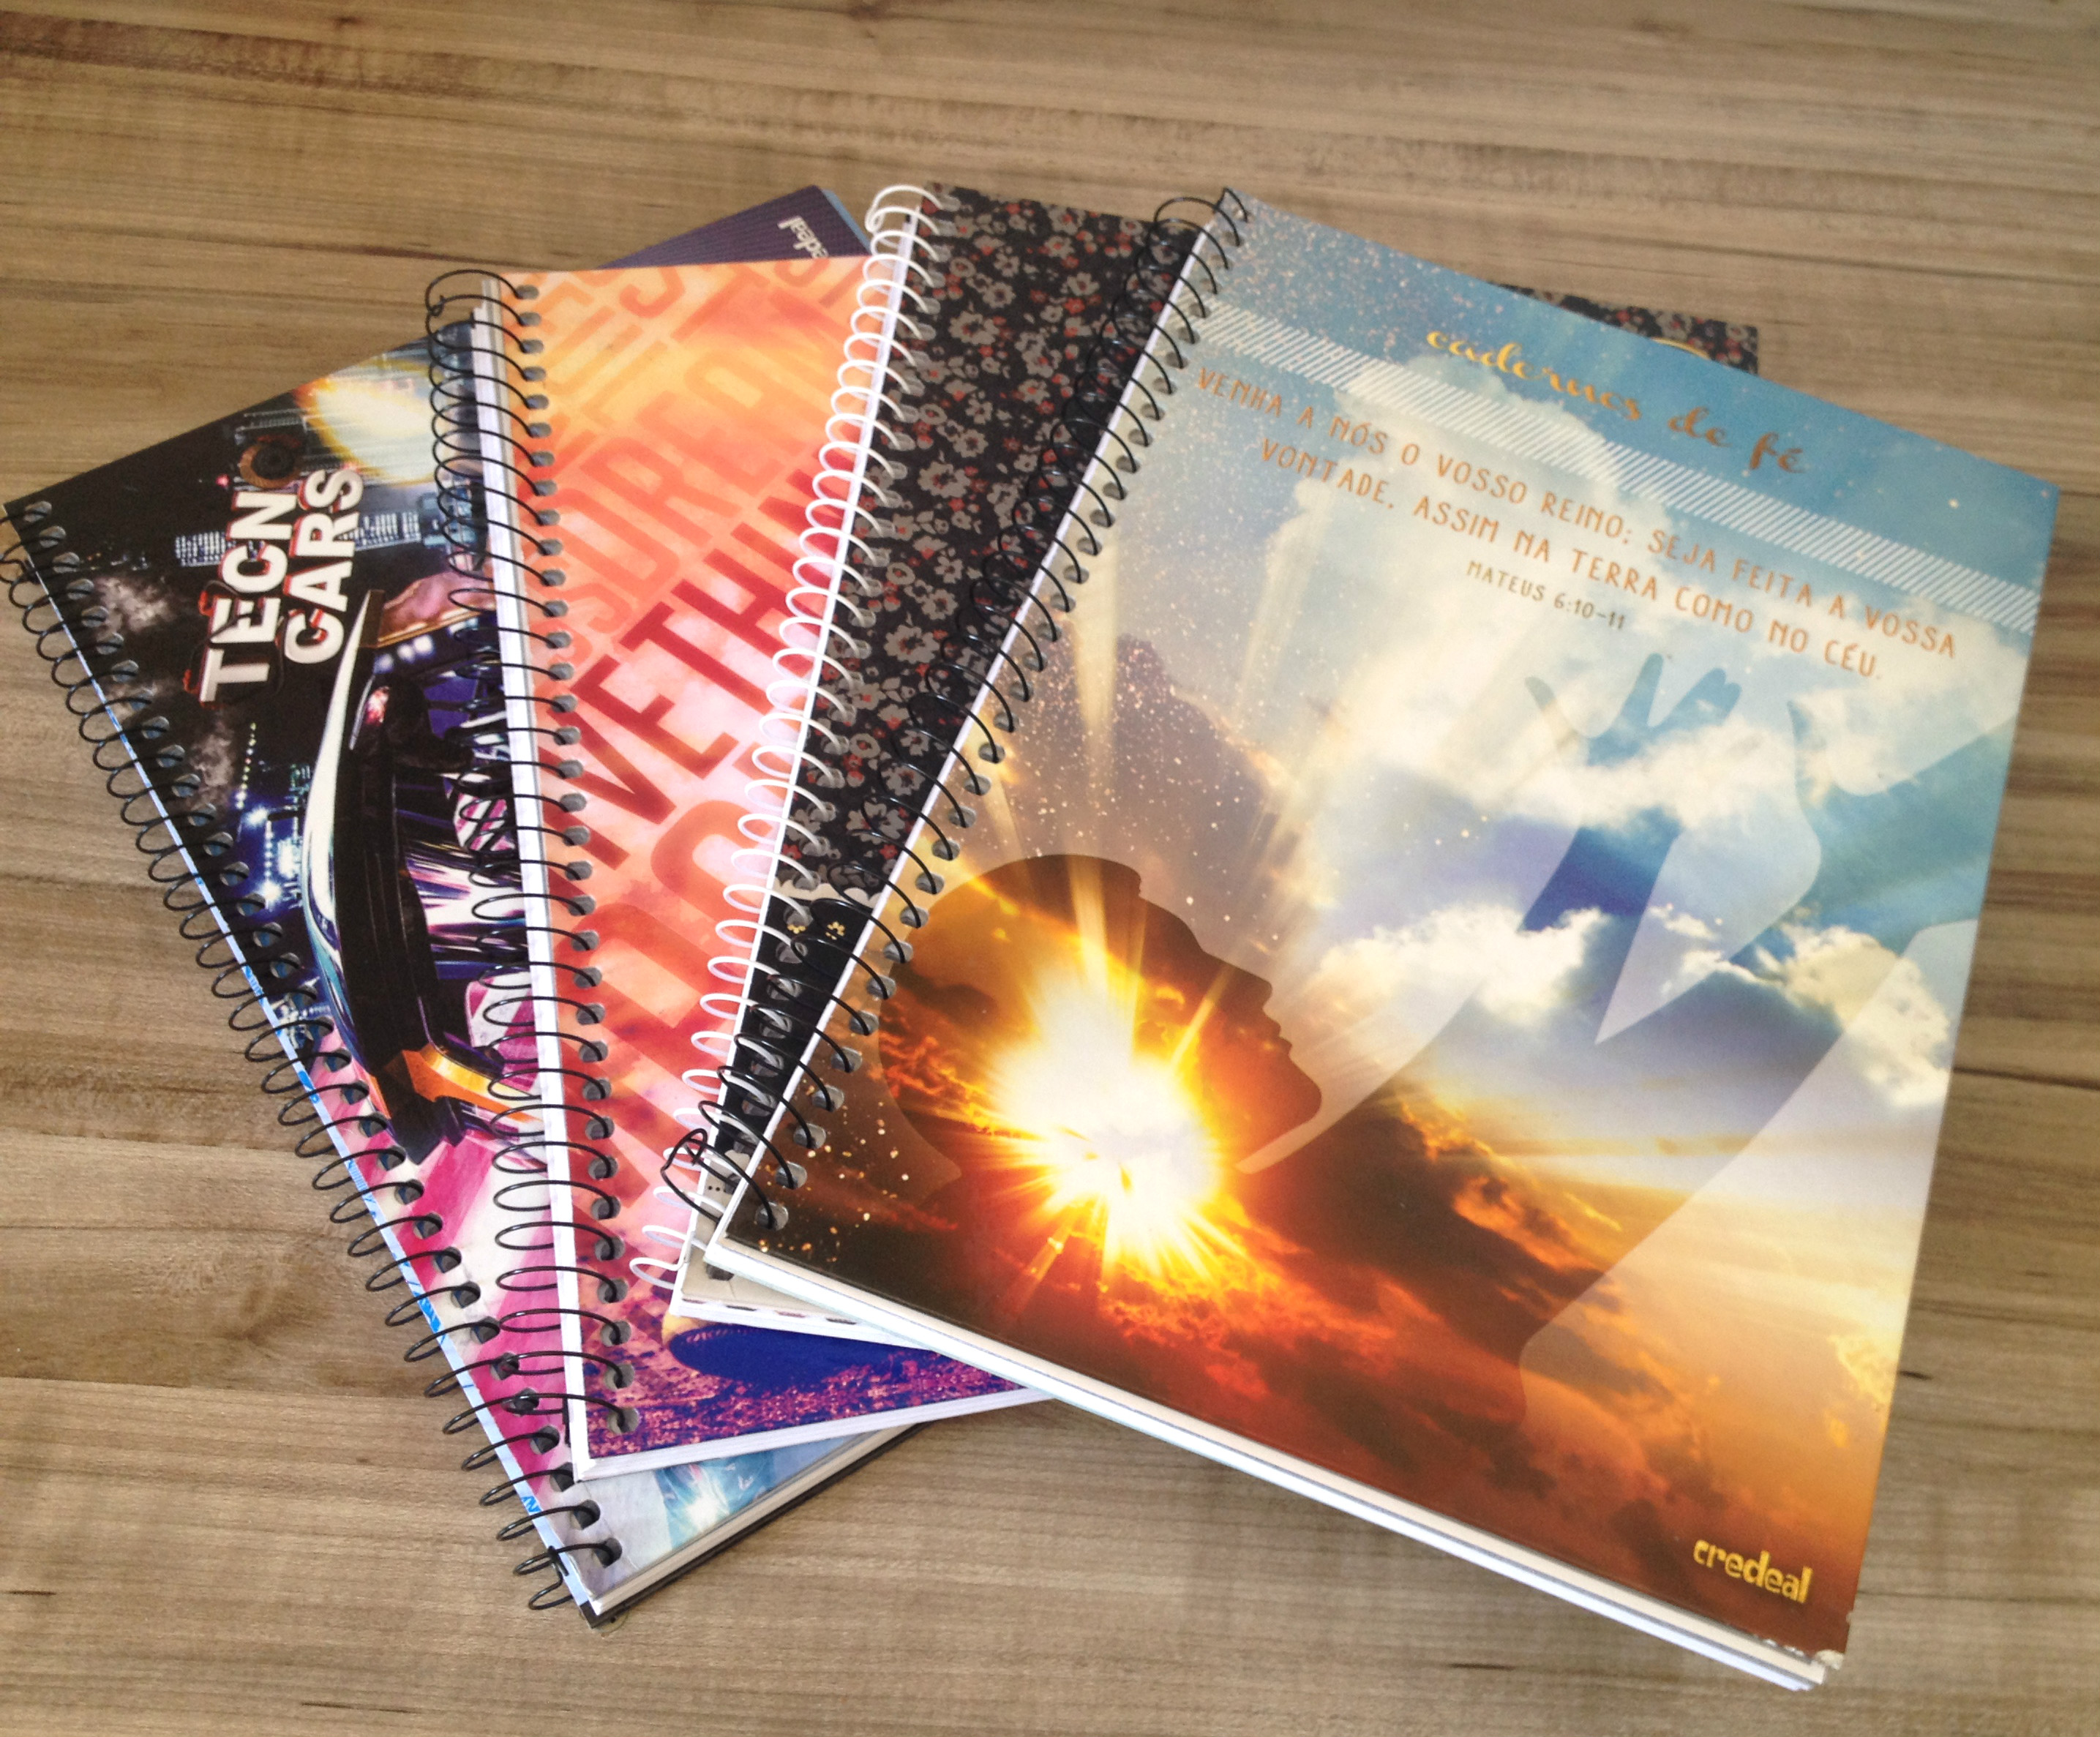 Cadernos Credeal